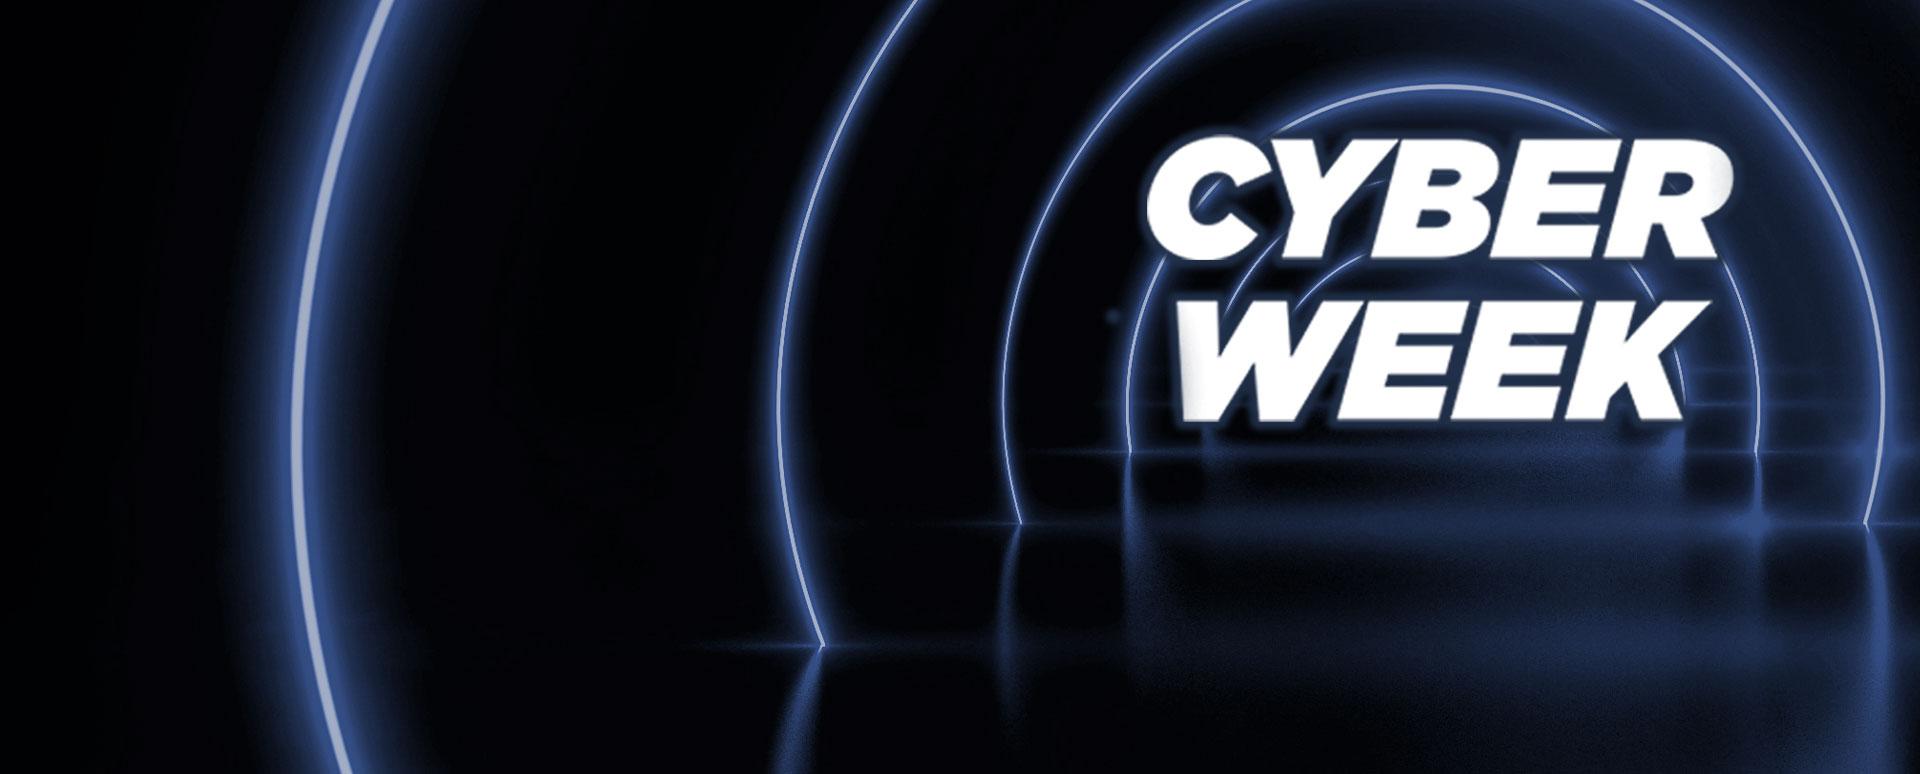 Cyber Week: Special Offer